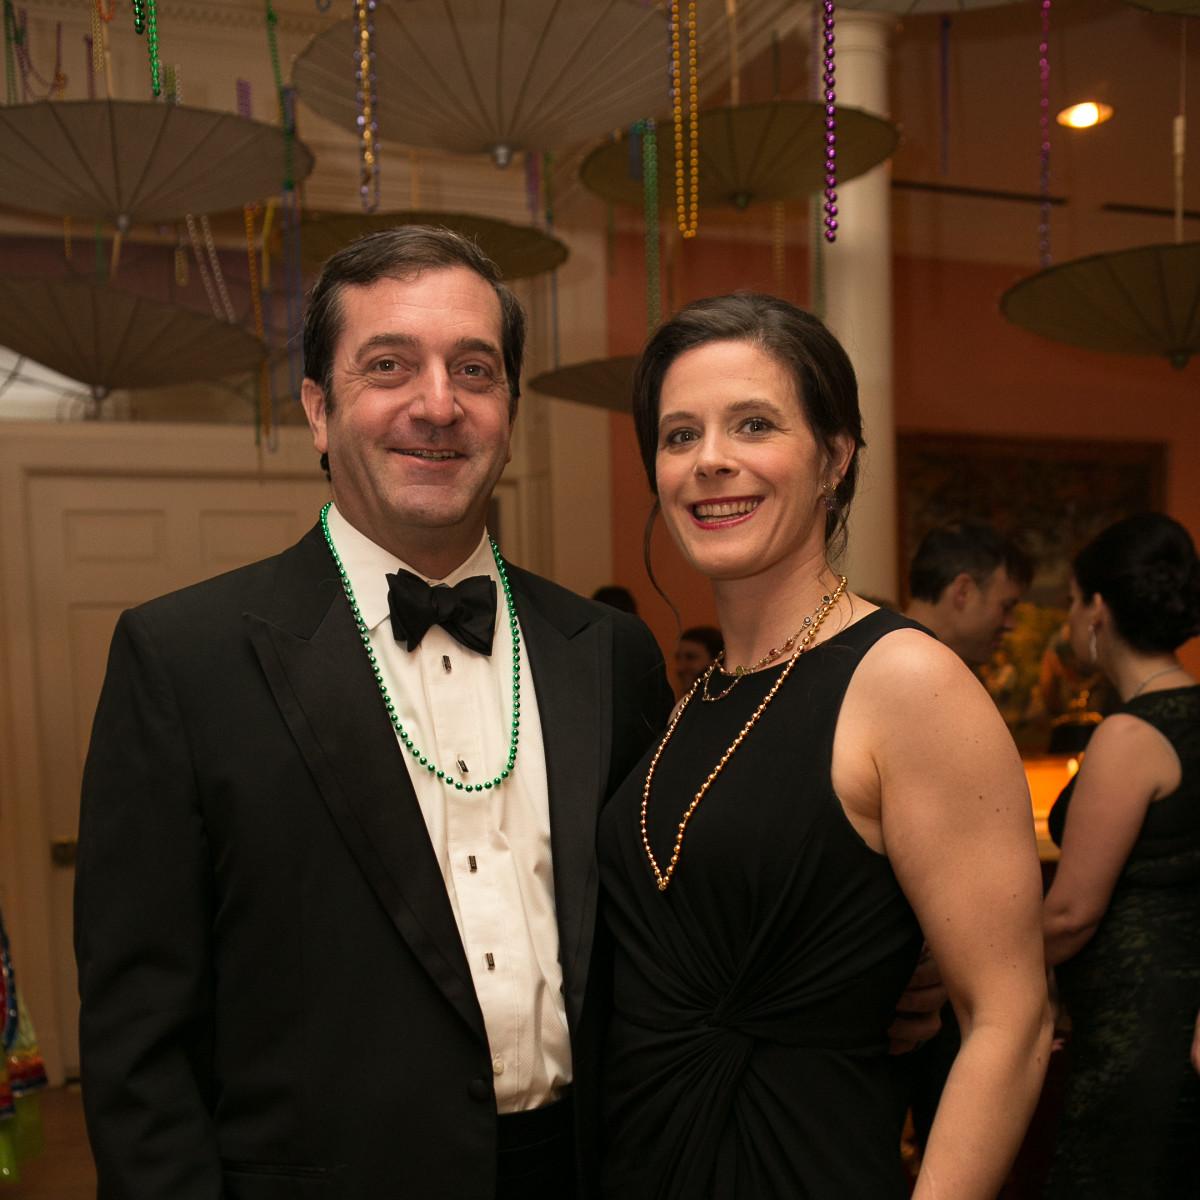 Junior League Gala, Feb. 2016, Michael Kezirian, Susanna Kise